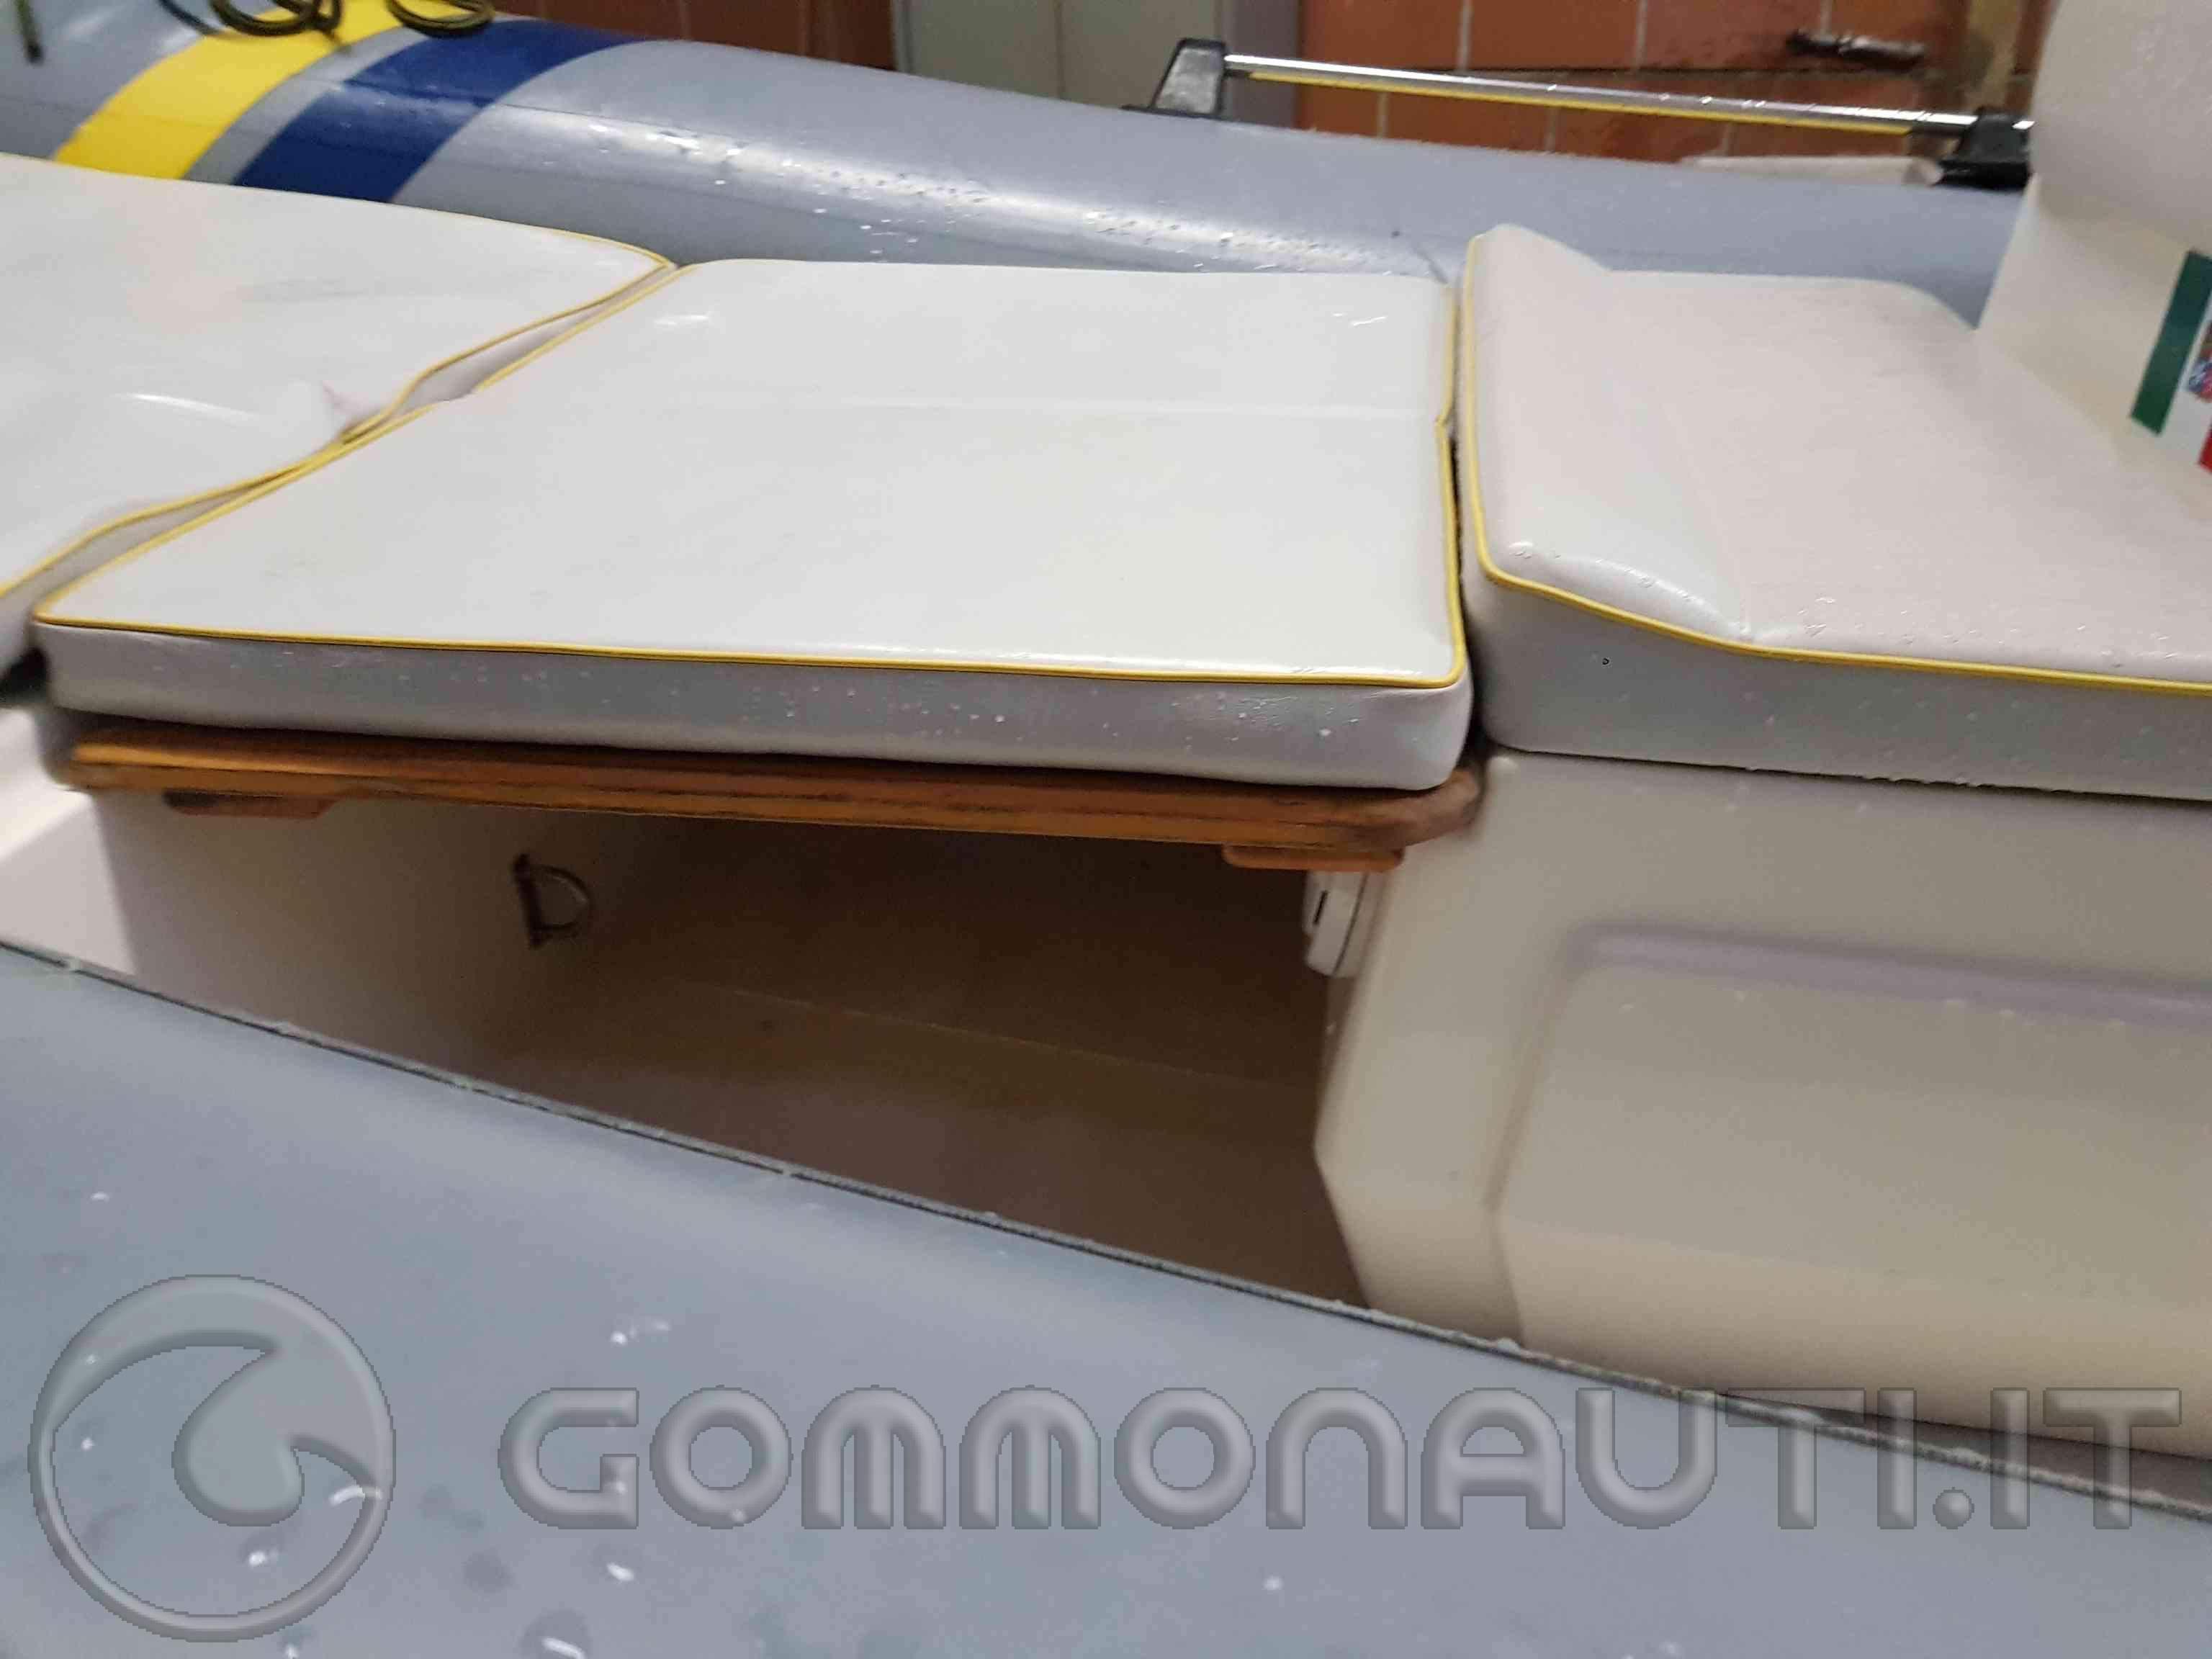 Marlin Boat 4.80 + Carrello No Motore